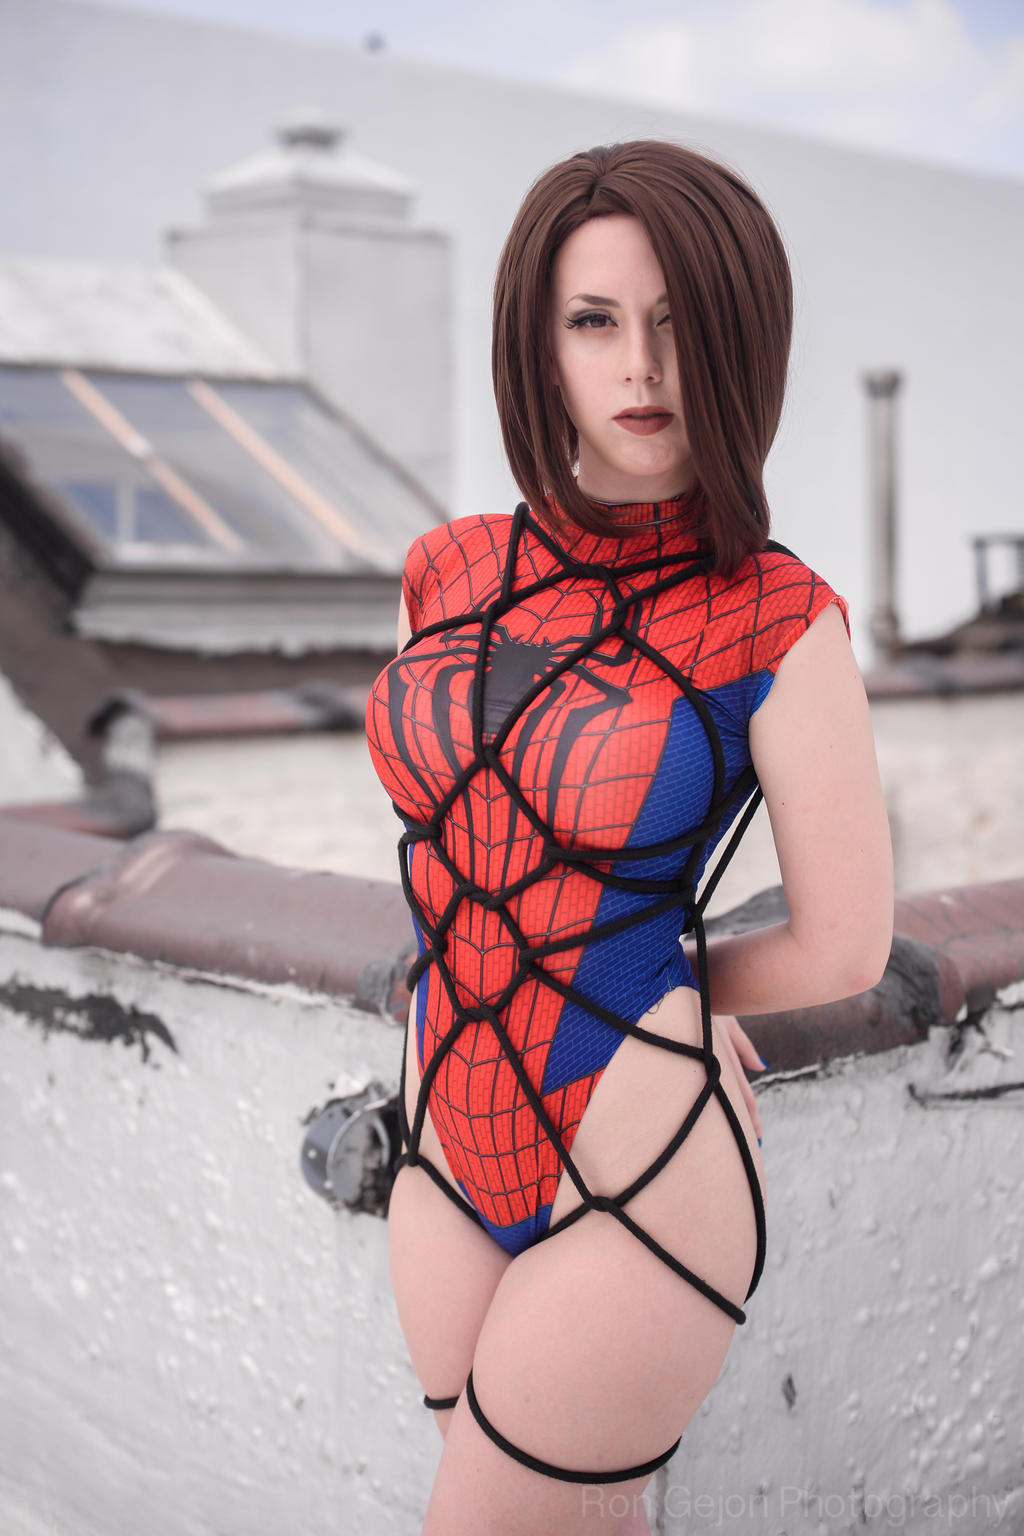 Just your Friendly Neighborhood Spiderman